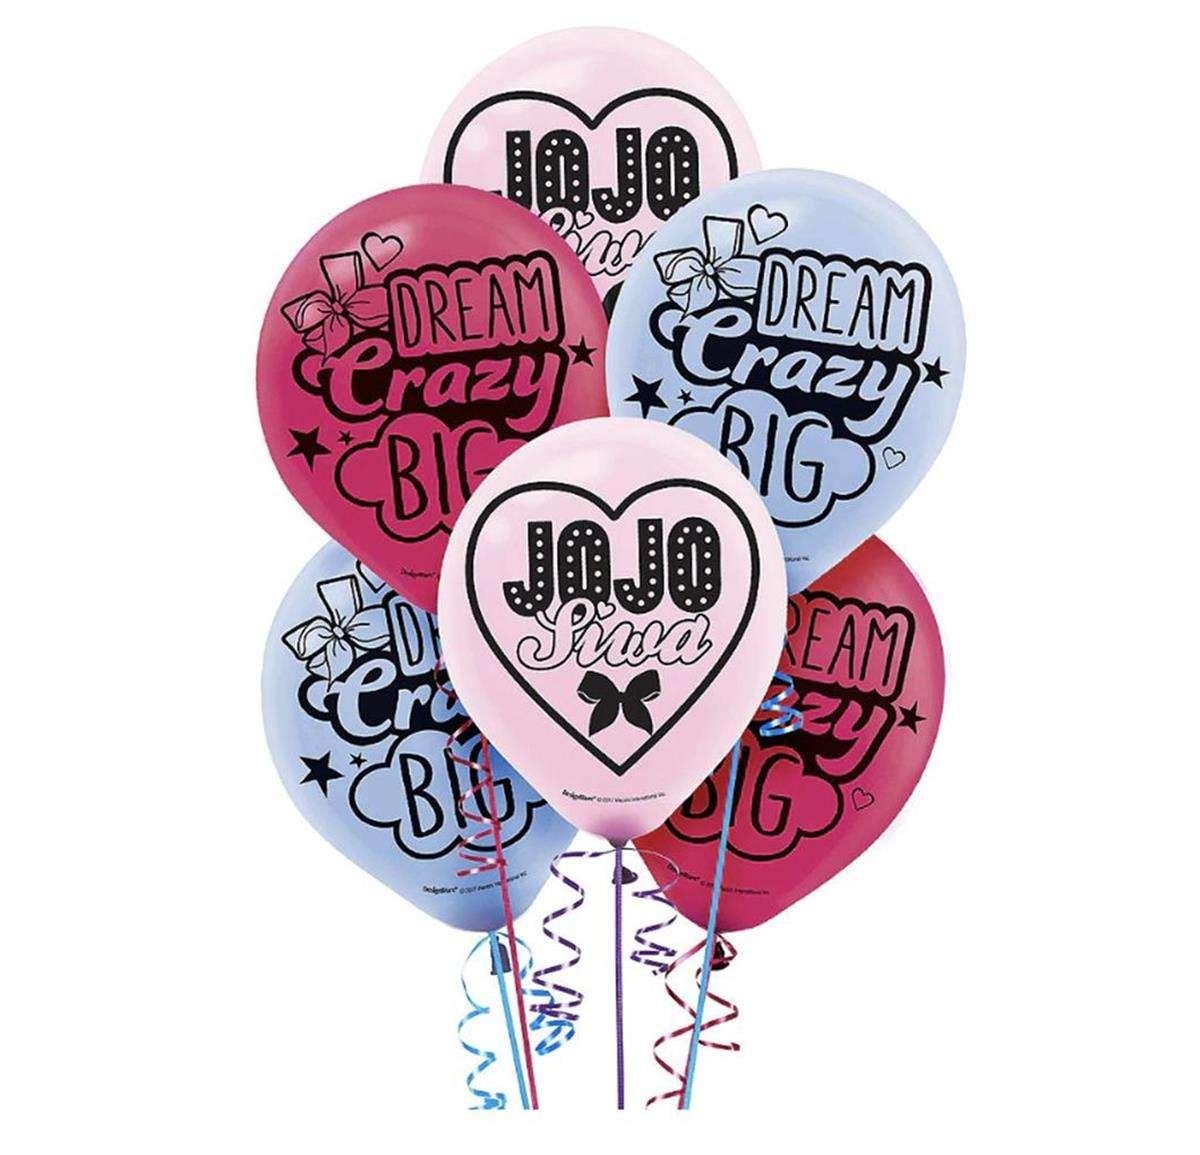 Outdoor Große Werbung <span class=keywords><strong>Helium</strong></span> <span class=keywords><strong>OEM</strong></span> Personalisierte Gedruckt Ballons <span class=keywords><strong>Luftballons</strong></span> mit Logo